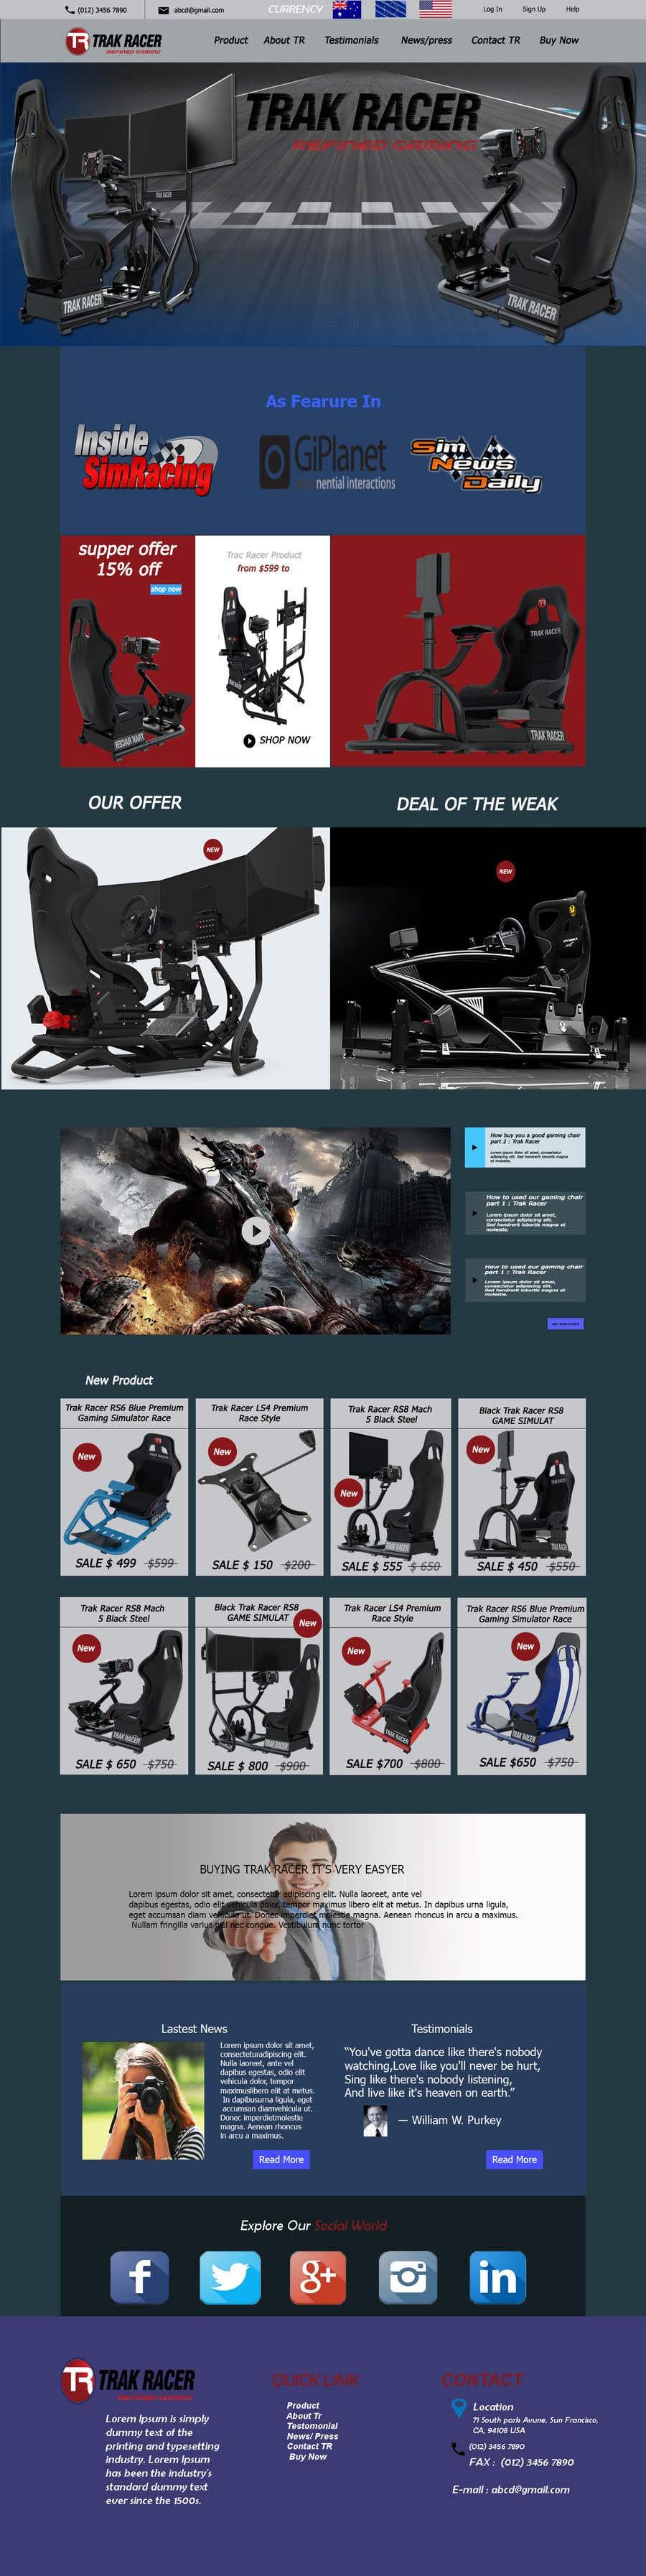 Penyertaan Peraduan #24 untuk Design a home page including header and footer